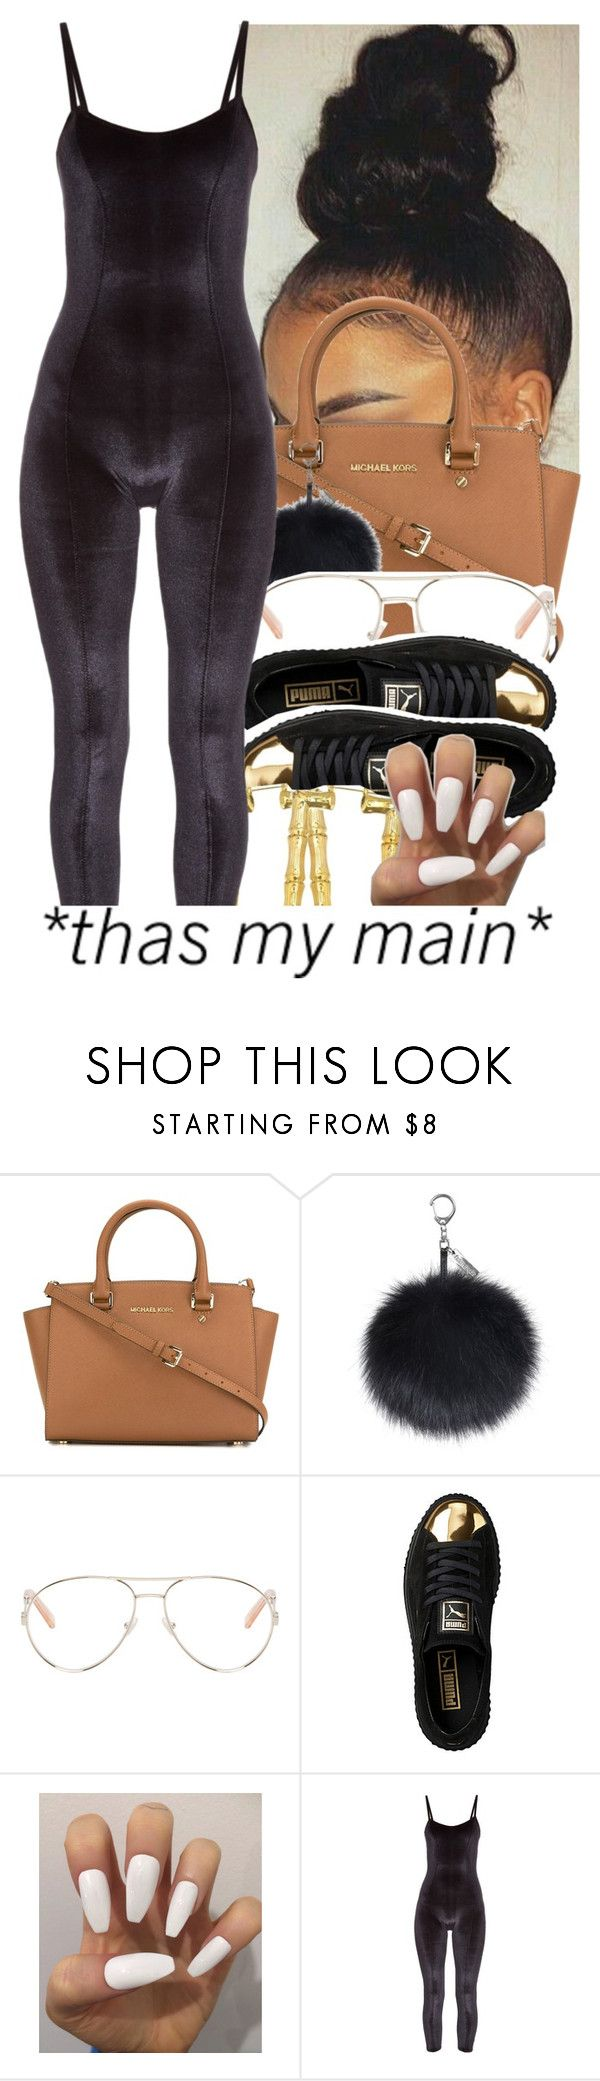 """She ma main one✨❤👌👊"" by slayed-fashion ❤ liked on Polyvore featuring MICHAEL Michael Kors, Chloé, Puma and Lisa Marie Fernandez"